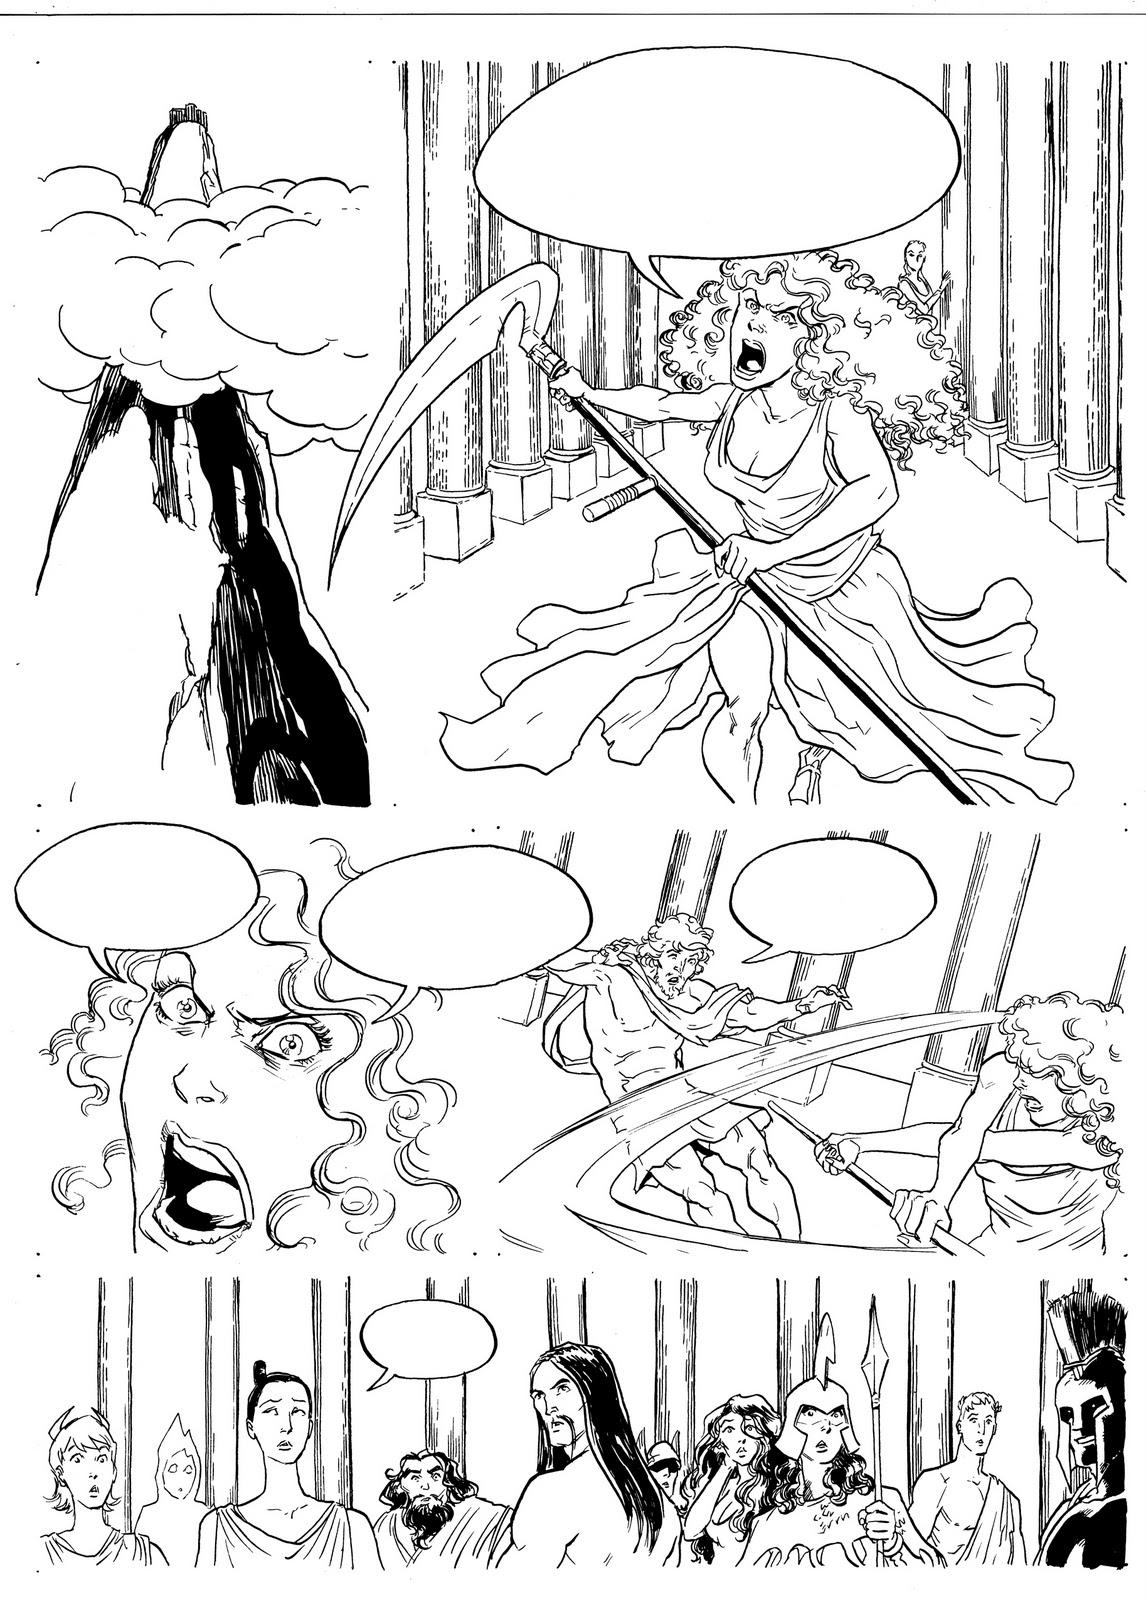 Hera Greek Goddess Cartoon Specifically, hera's